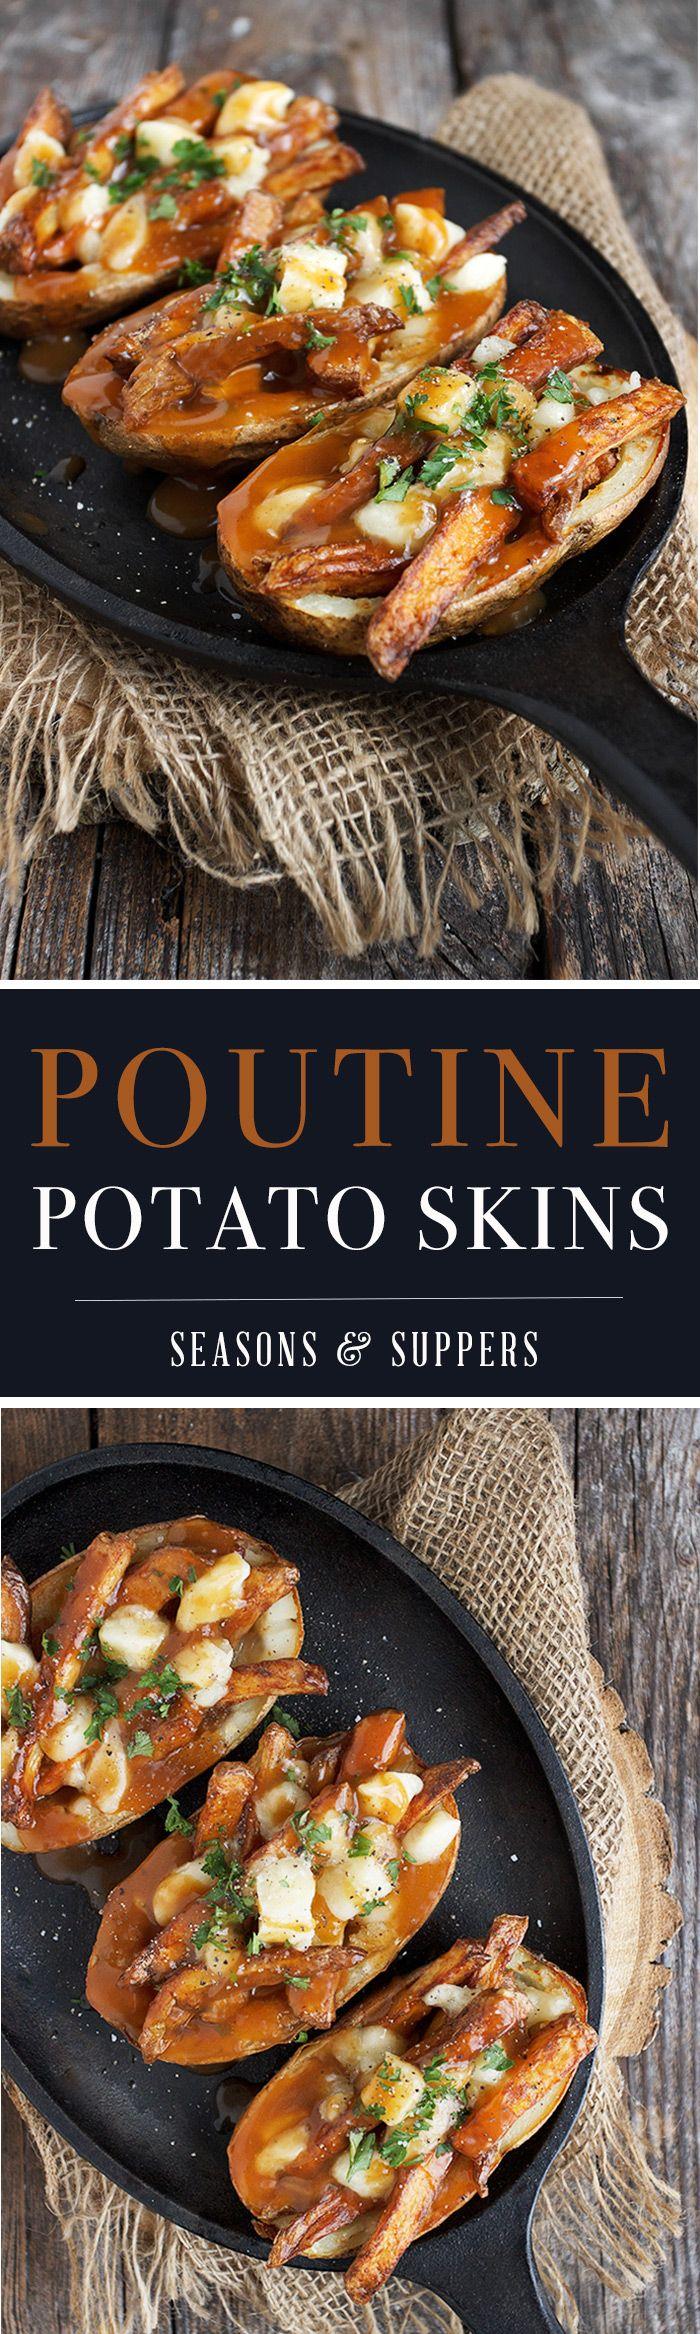 Poutine Potato Skins - great (and easy) football food!